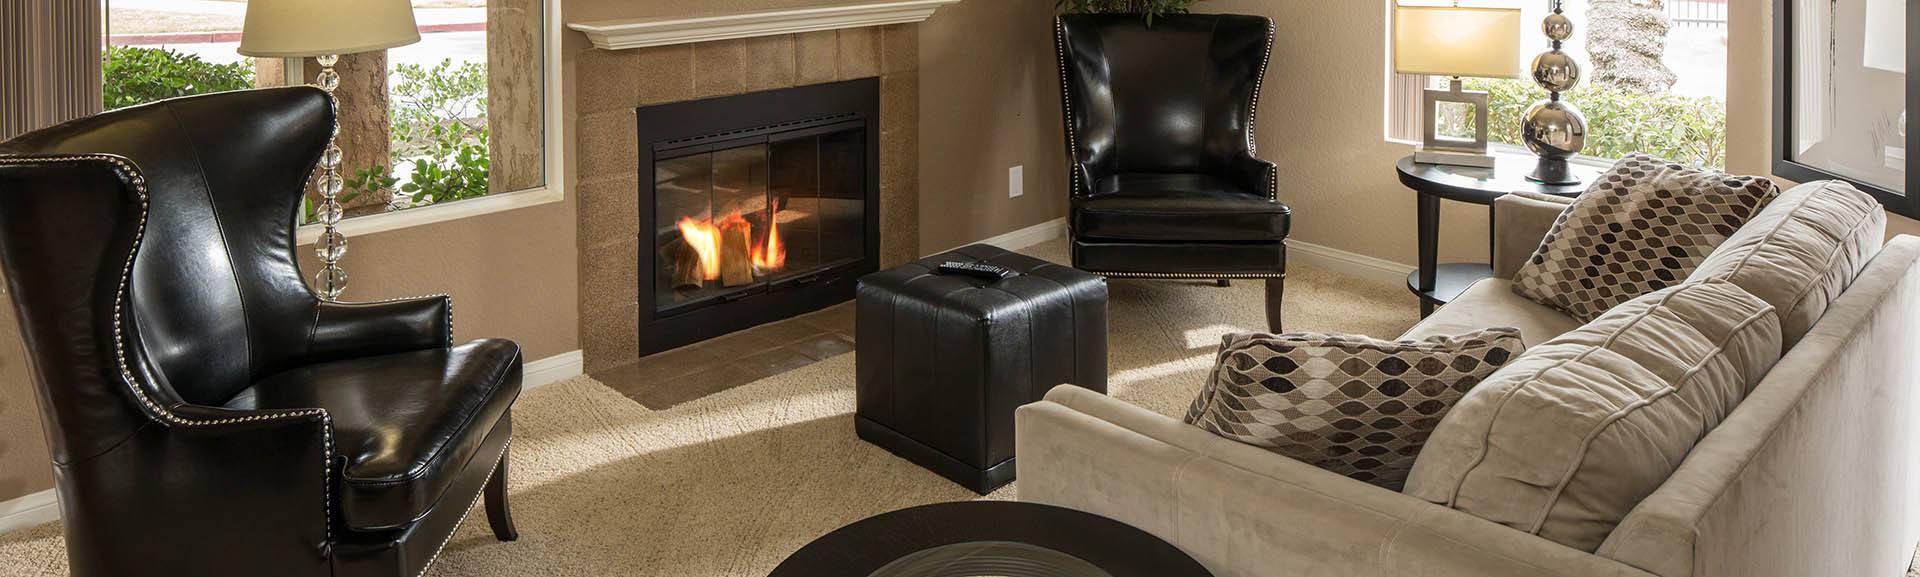 View our floor plans at Hidden Hills Condominium Rentals on our website